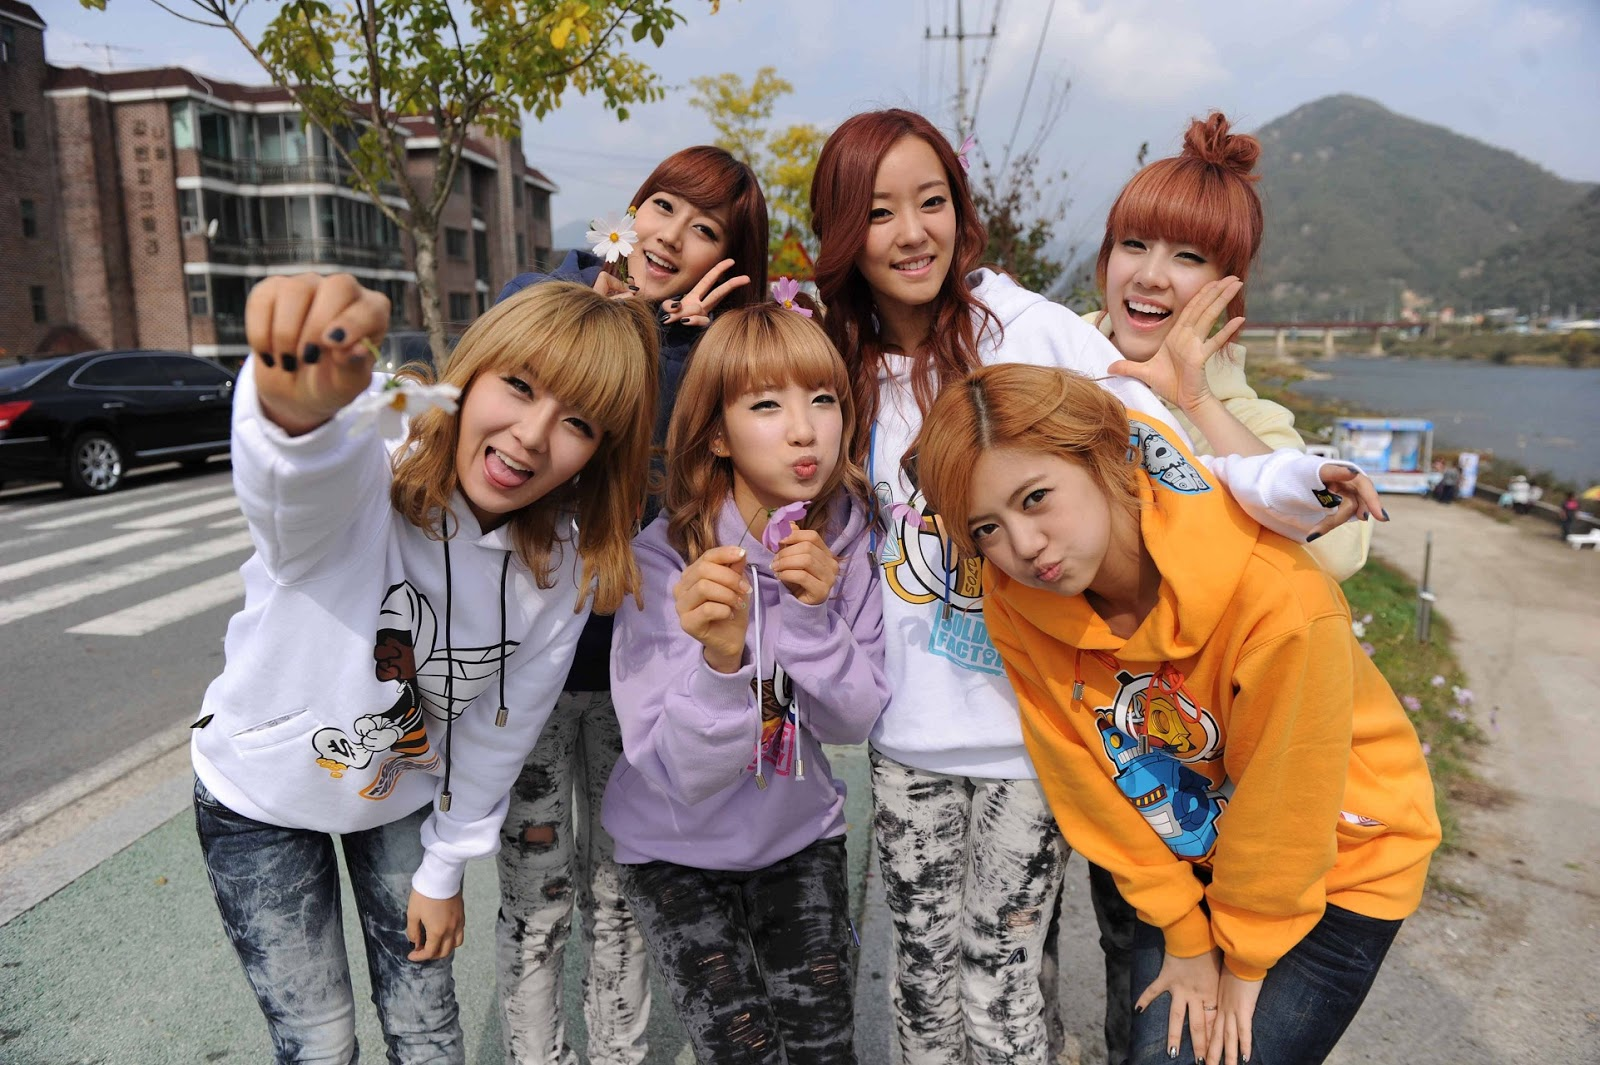 http://3.bp.blogspot.com/-WuIVAF-uF1c/UROx30_Uv-I/AAAAAAAAbqQ/2qcXsWWGo9Q/s1600/Rainbow+Wallpaper+HD.jpg